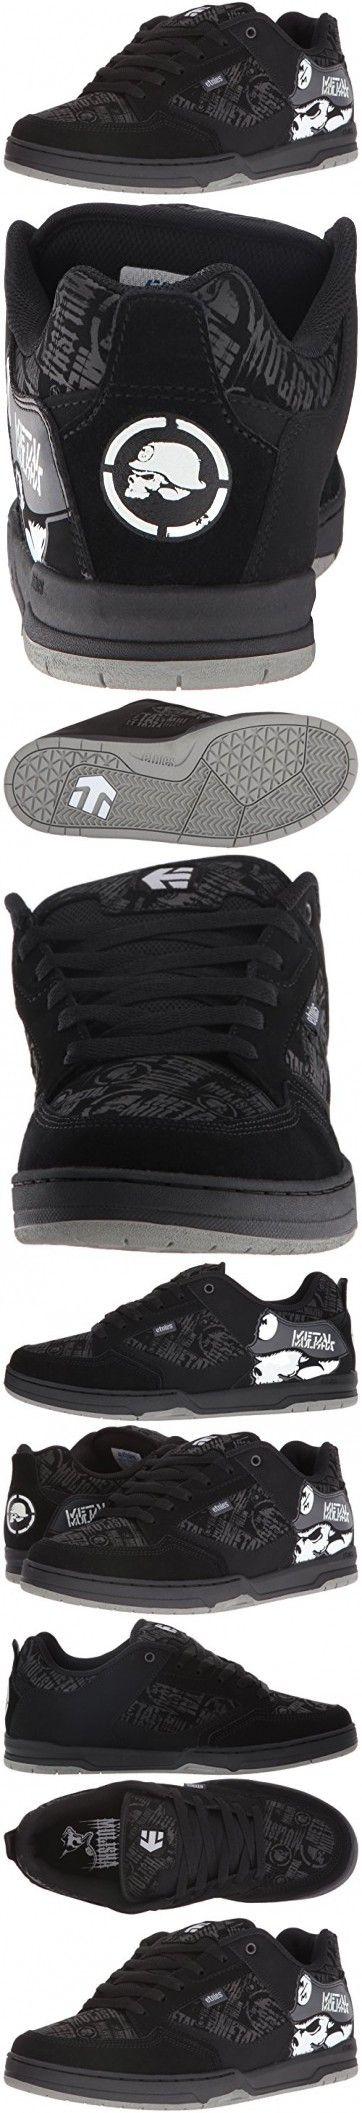 Etnies Men's Jameson SC Skateboarding Shoe, Dark Grey/White, 10.5 M US